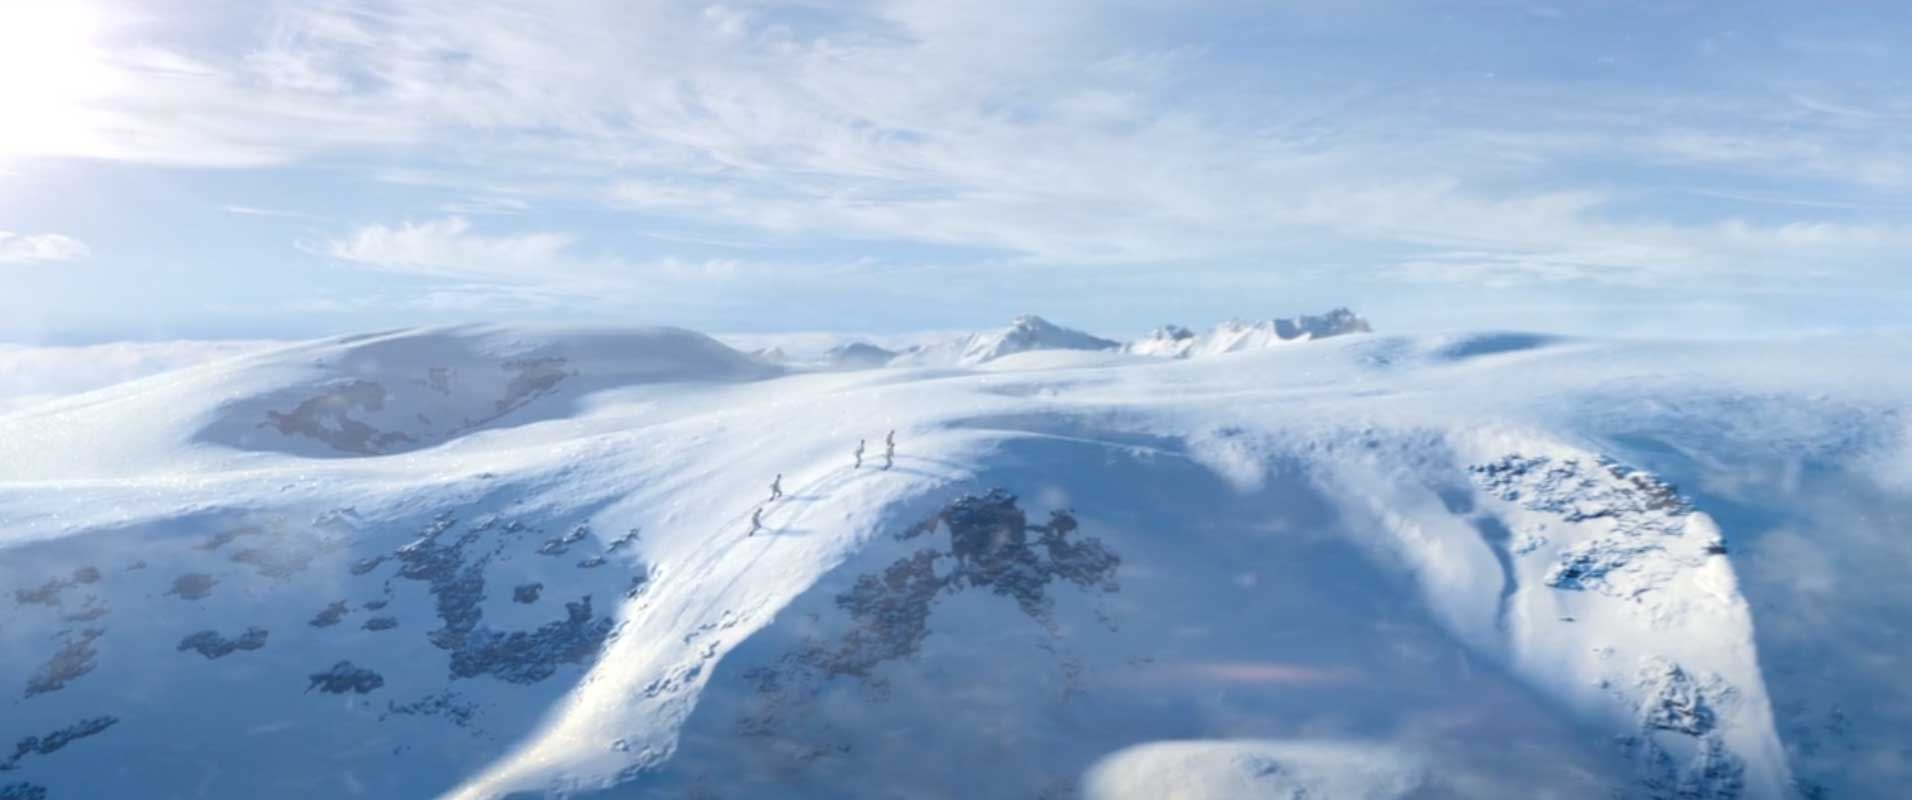 terranova-cover Terra Nova